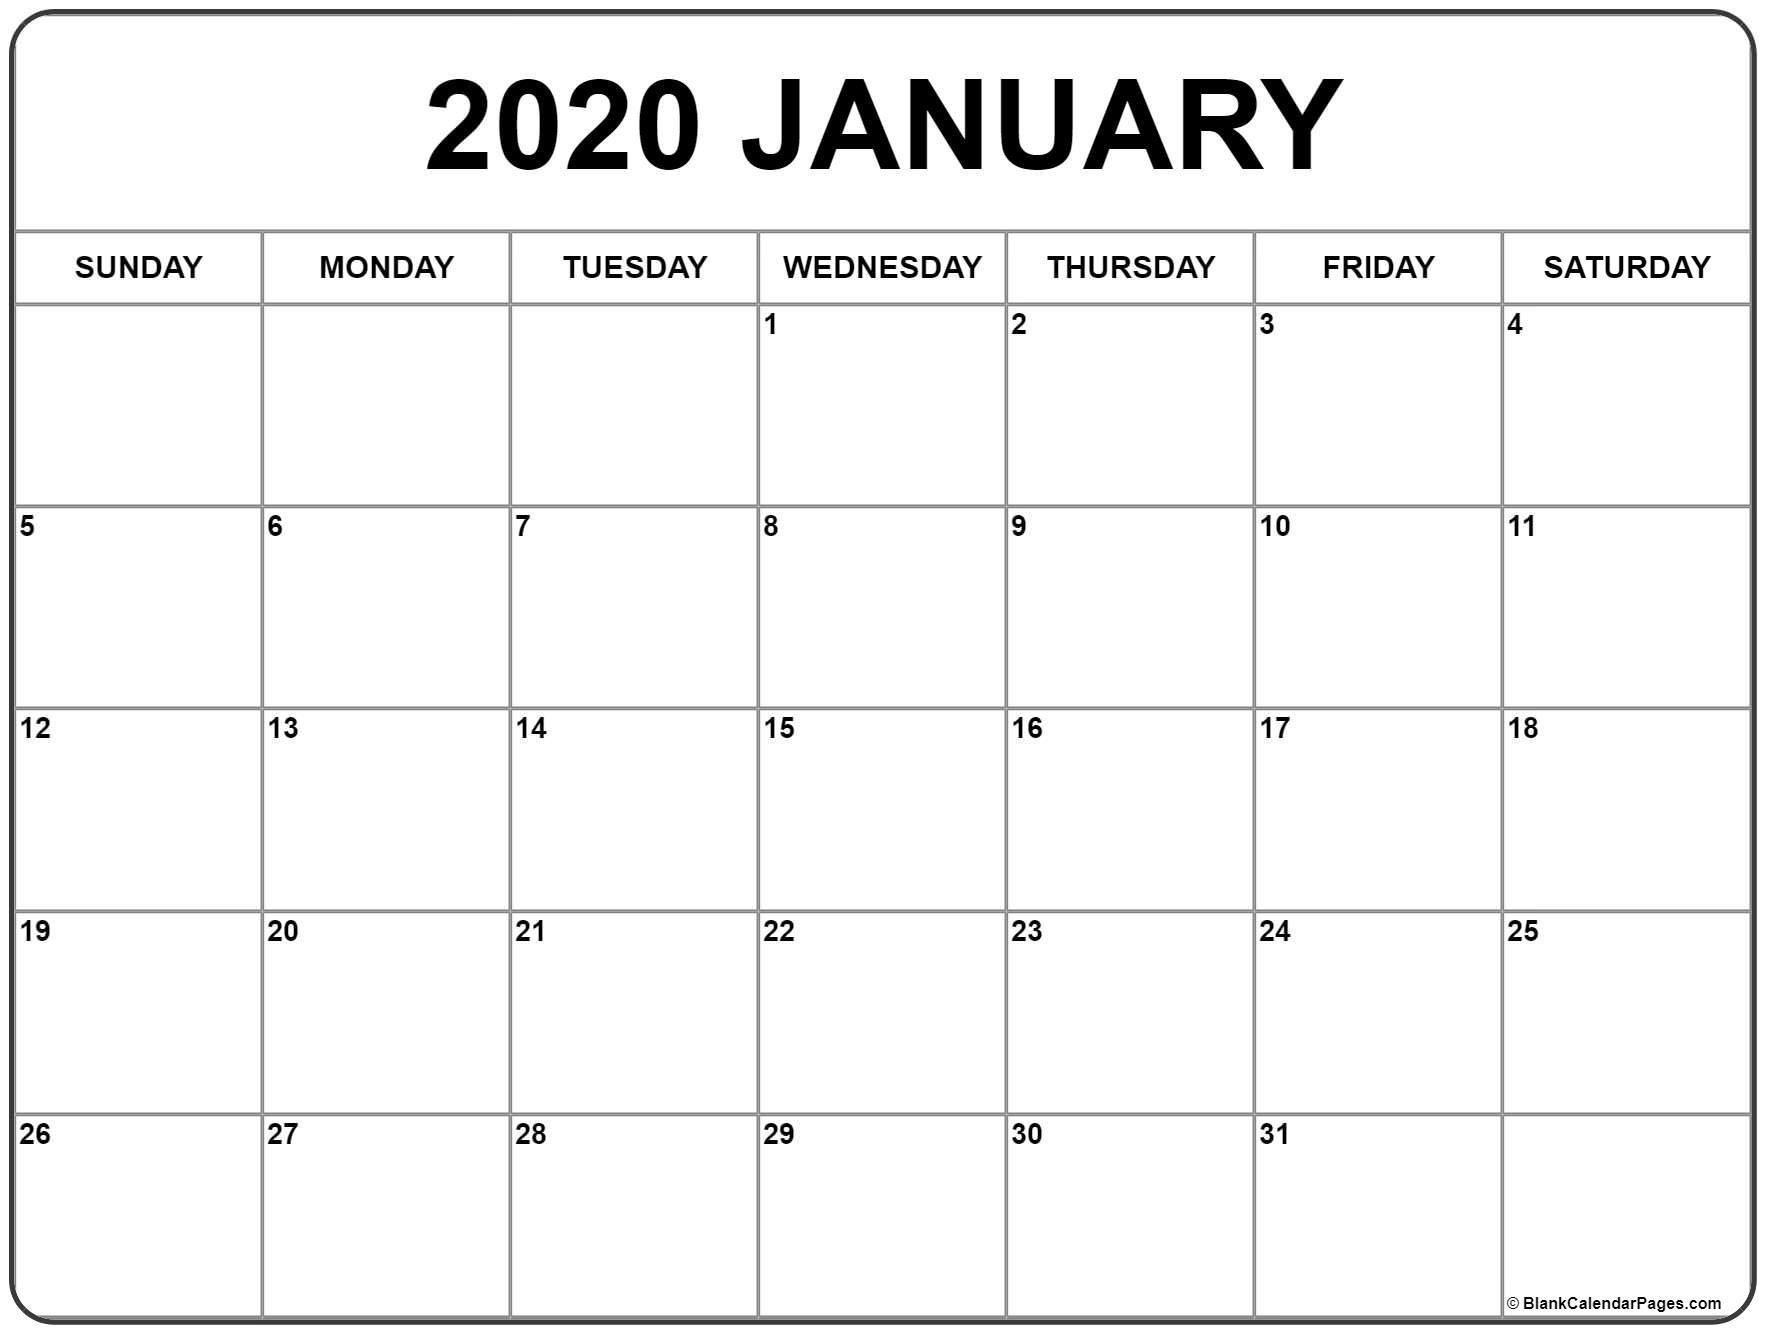 January 2020 Calendar | Free Printable Monthly Calendars with regard to 2020 Calendar Free